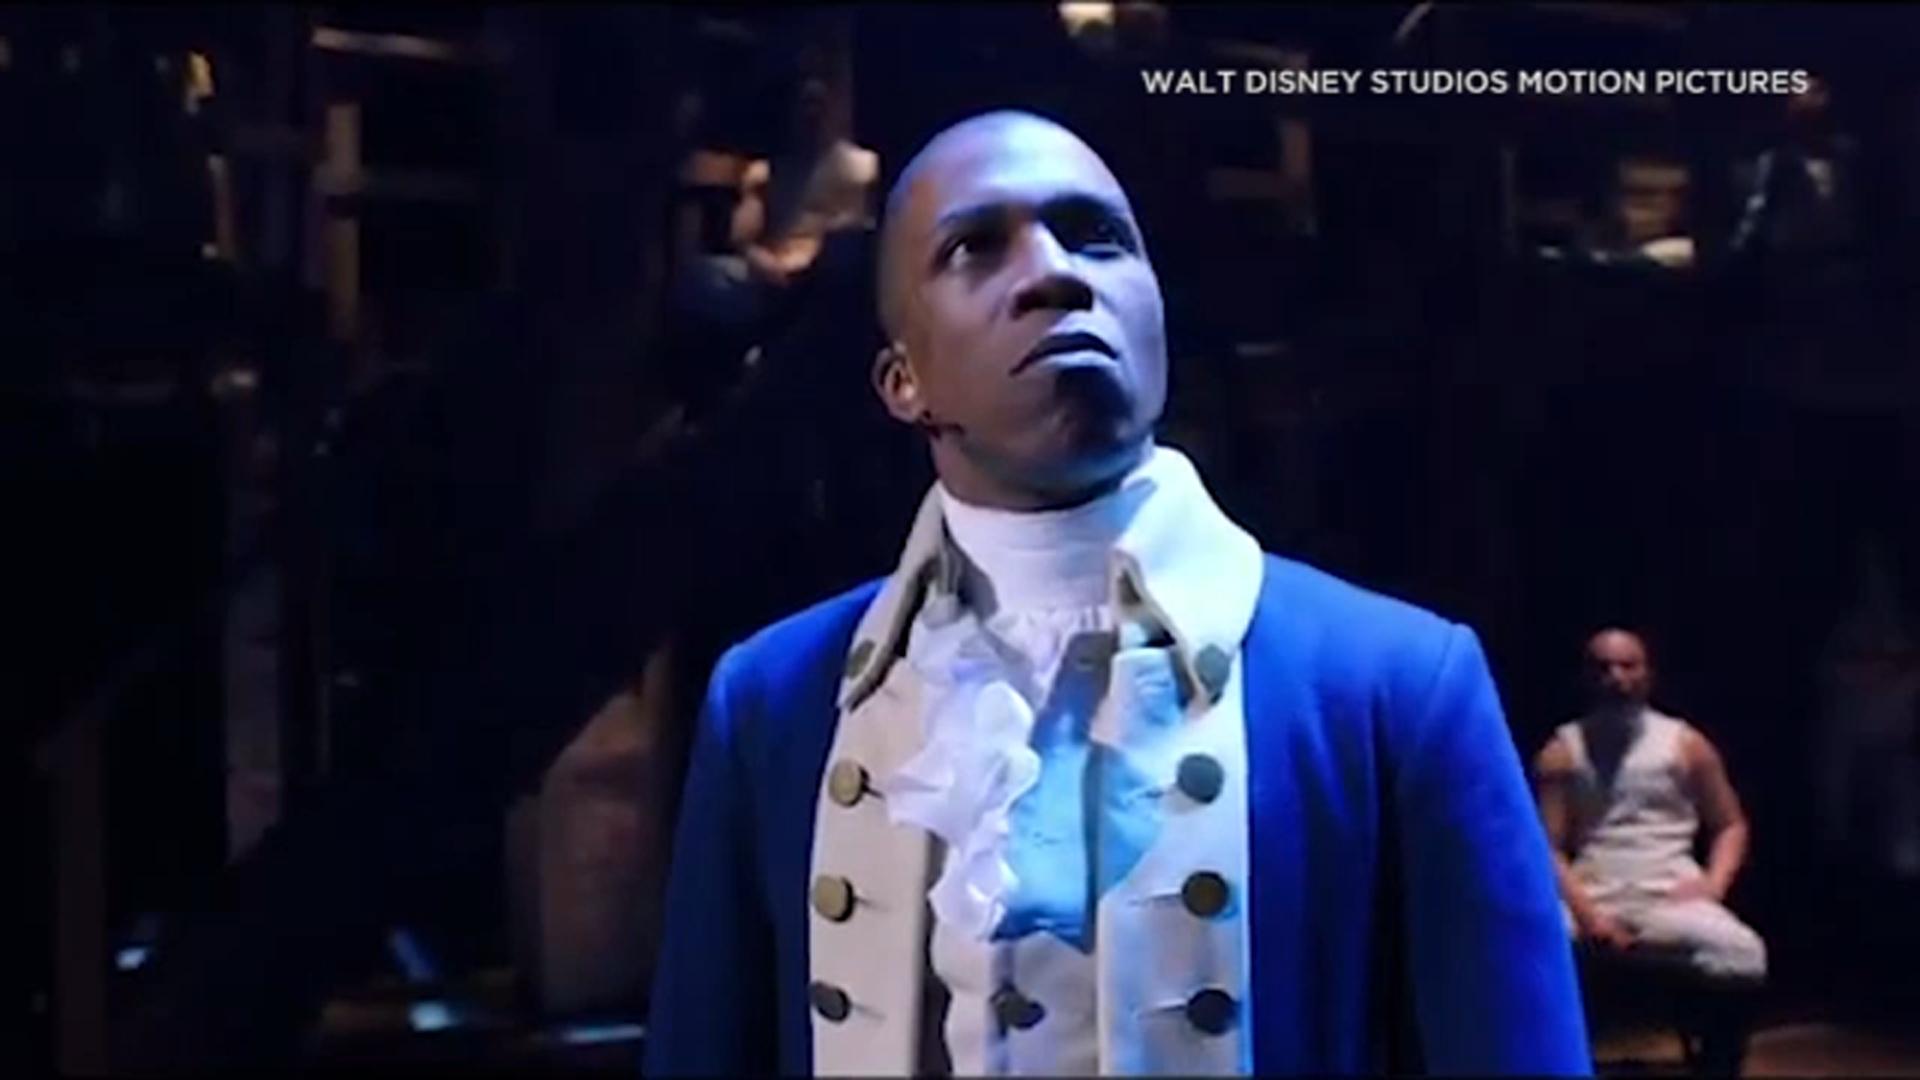 'Hamilton' on Disney Plus: Meet Lin-Manuel Miranda and other original cast members